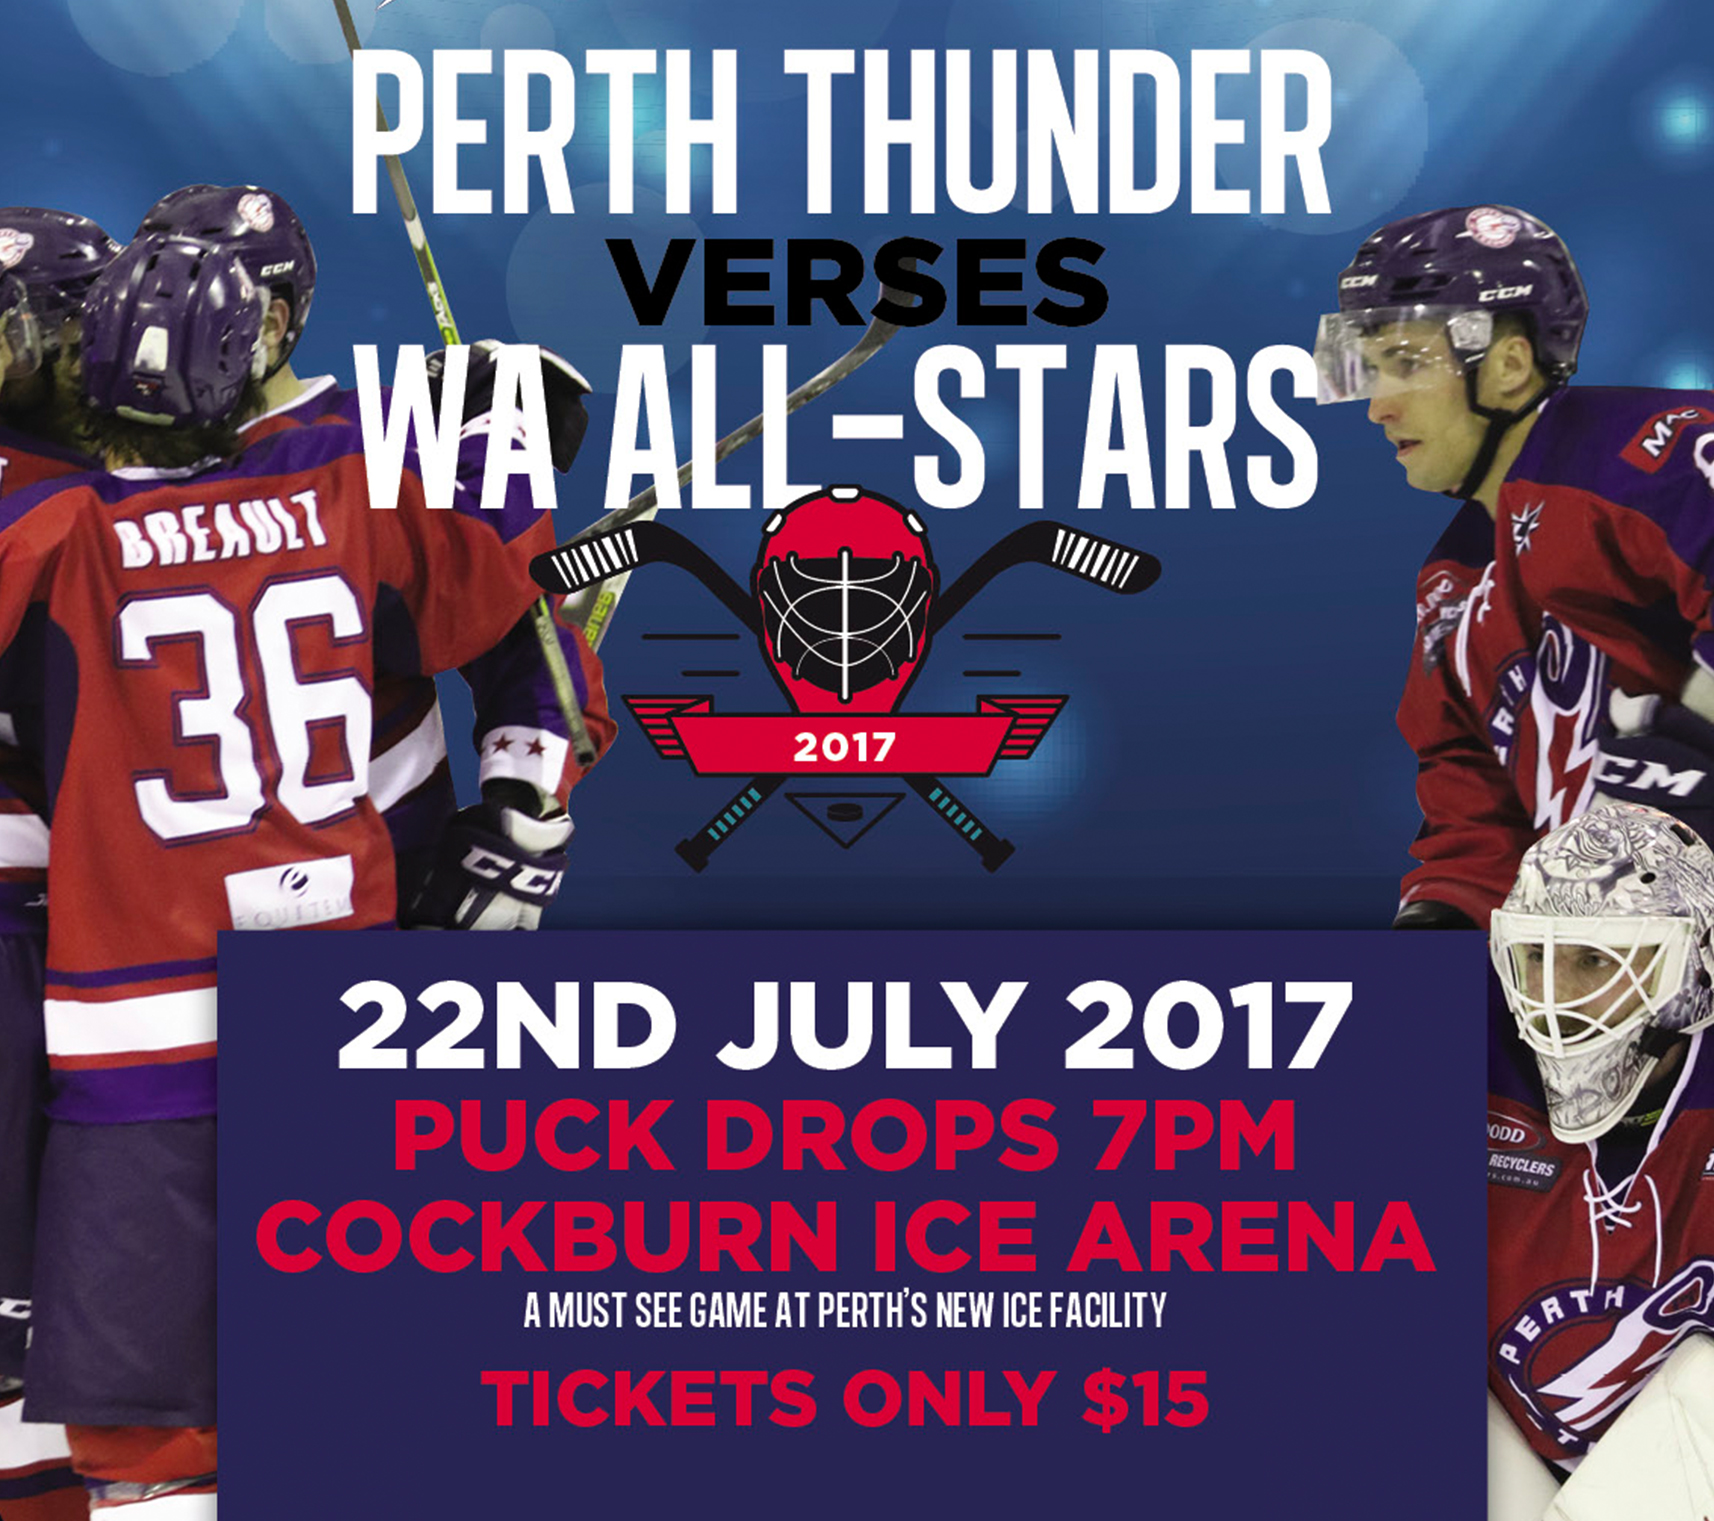 Perth Thunder Cockburn Ice Arena